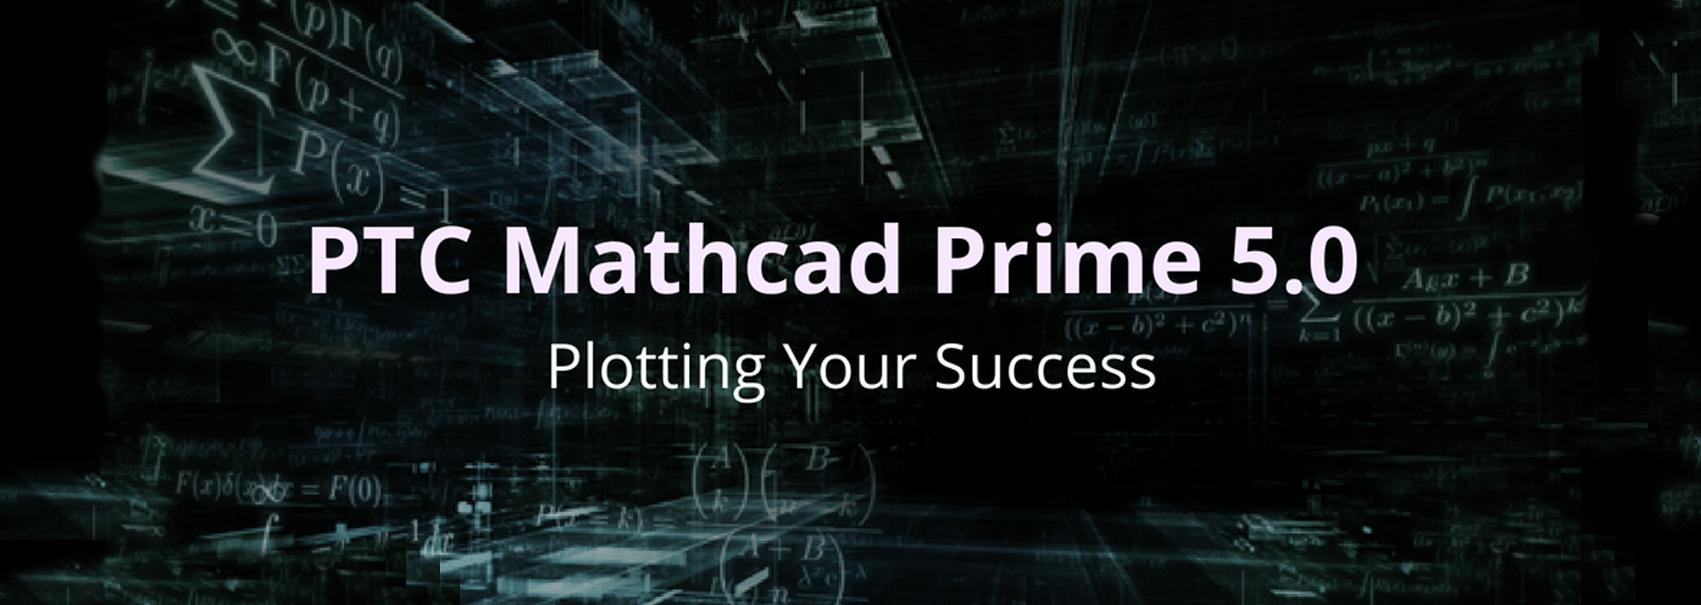 PTC_Mathcad-Prime-5_Logo Mathcad